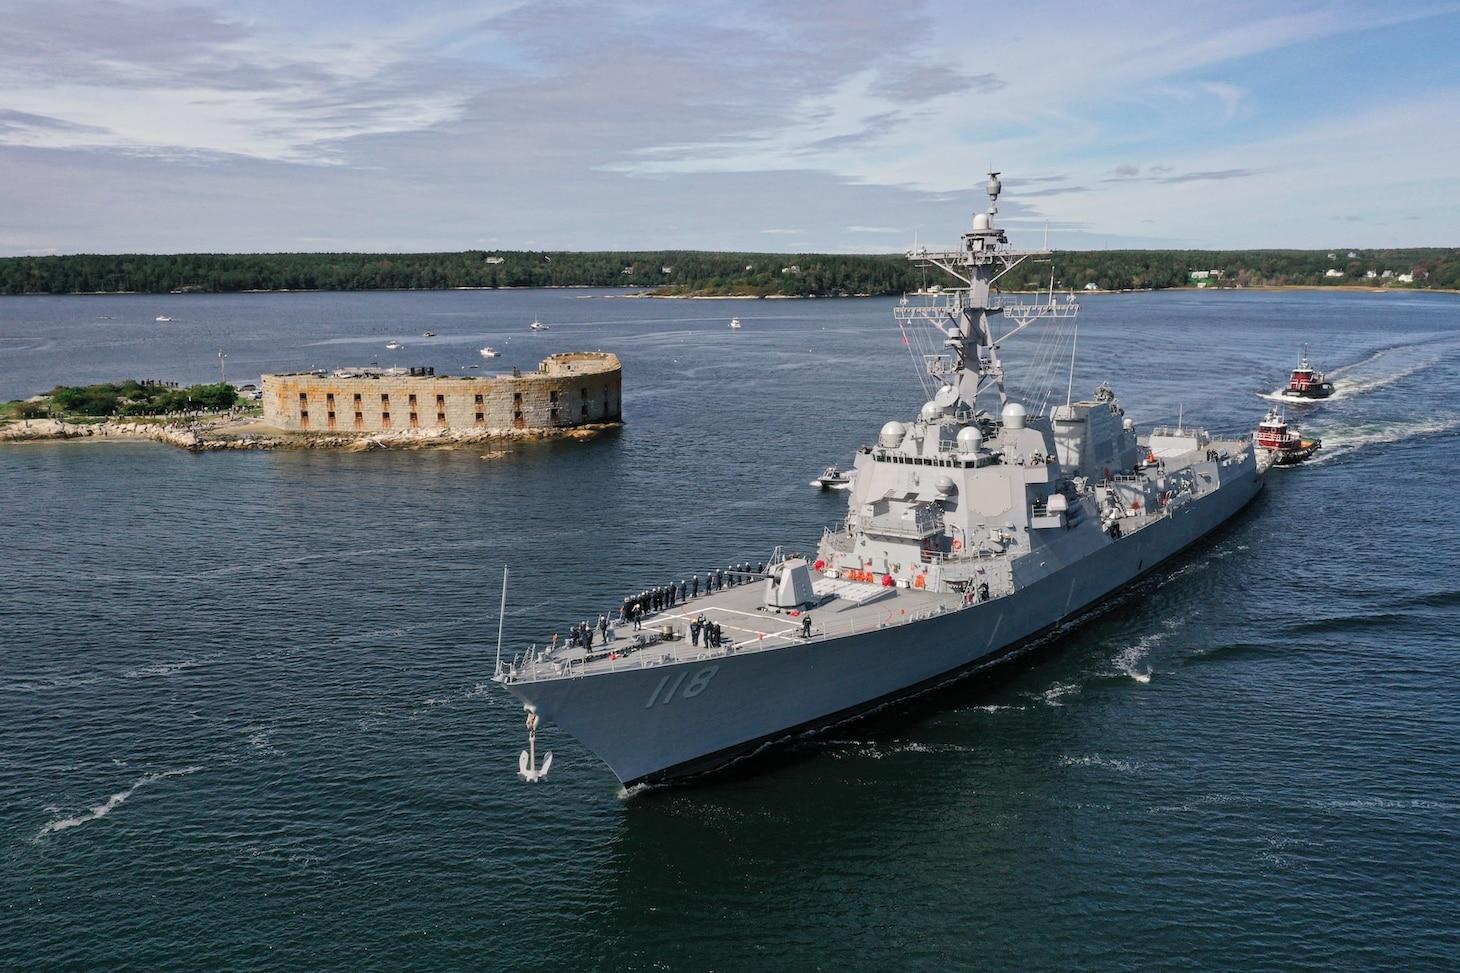 The future USS Daniel Inouye (DDG 118) departs General Dynamics Bath Iron Works shipyard.